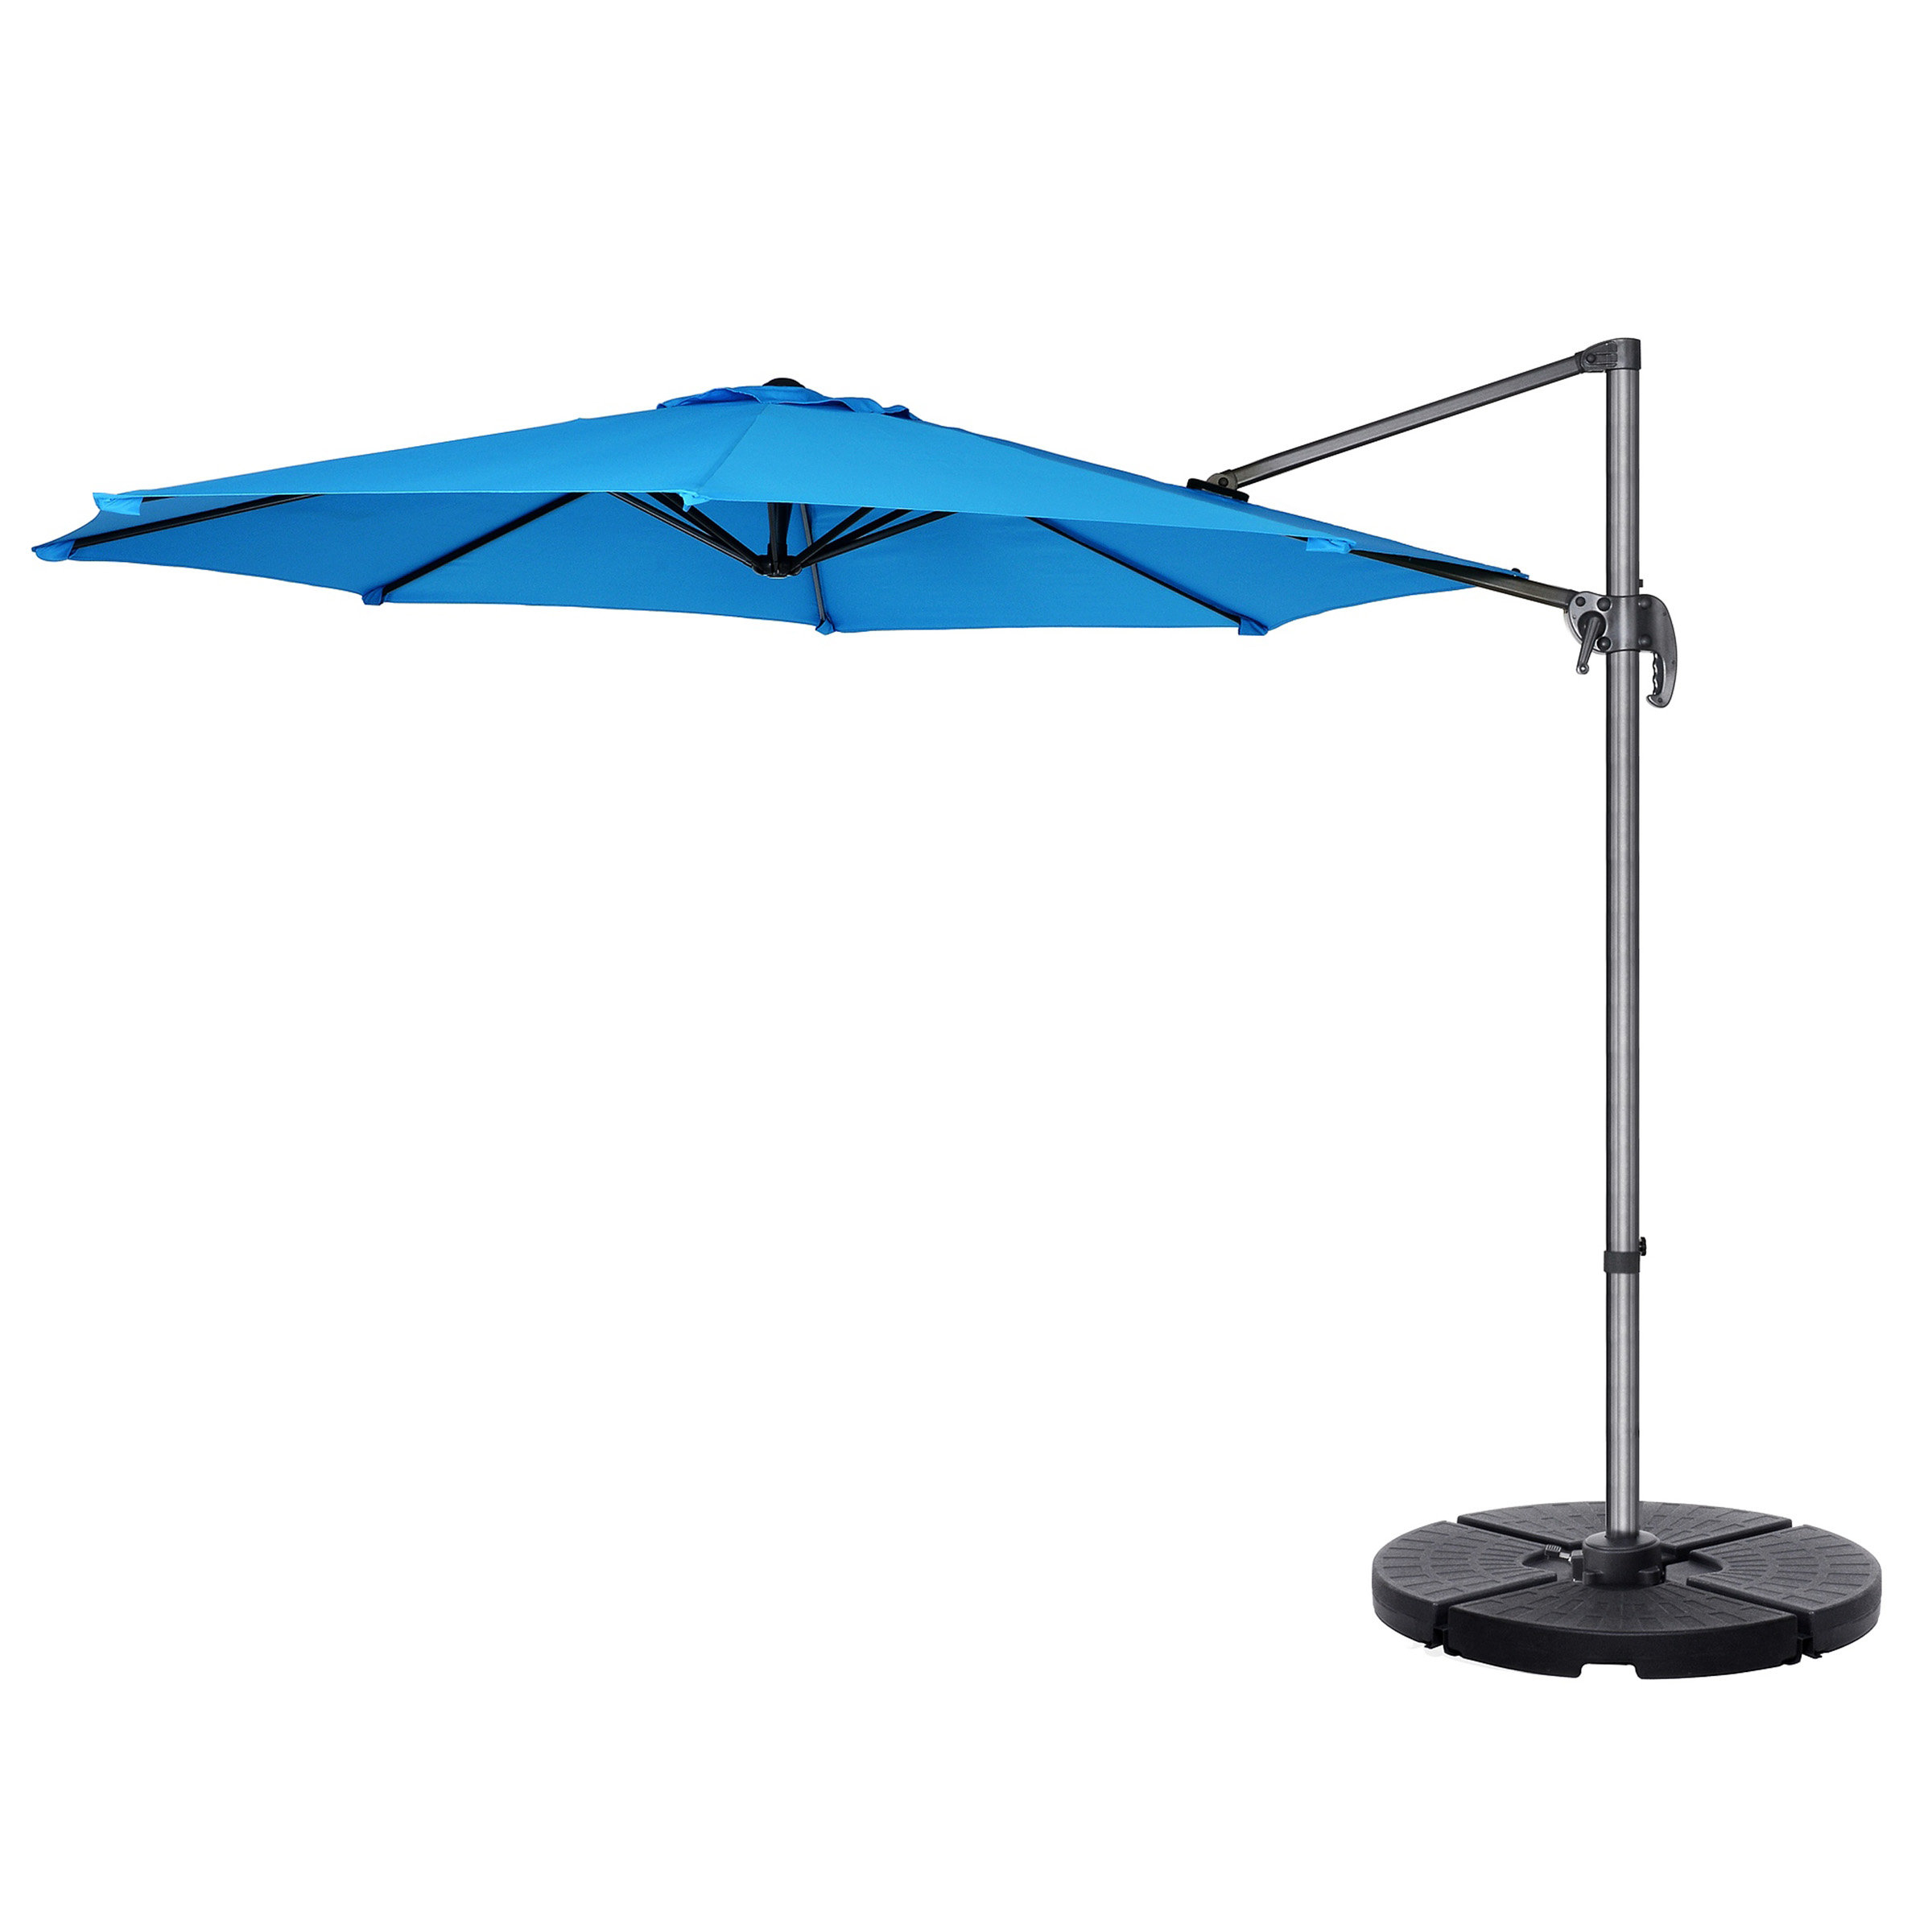 Current Cockermouth Rotating 10' Cantilever Umbrella Intended For Alyssa Freeport Park Market Umbrellas (View 2 of 20)